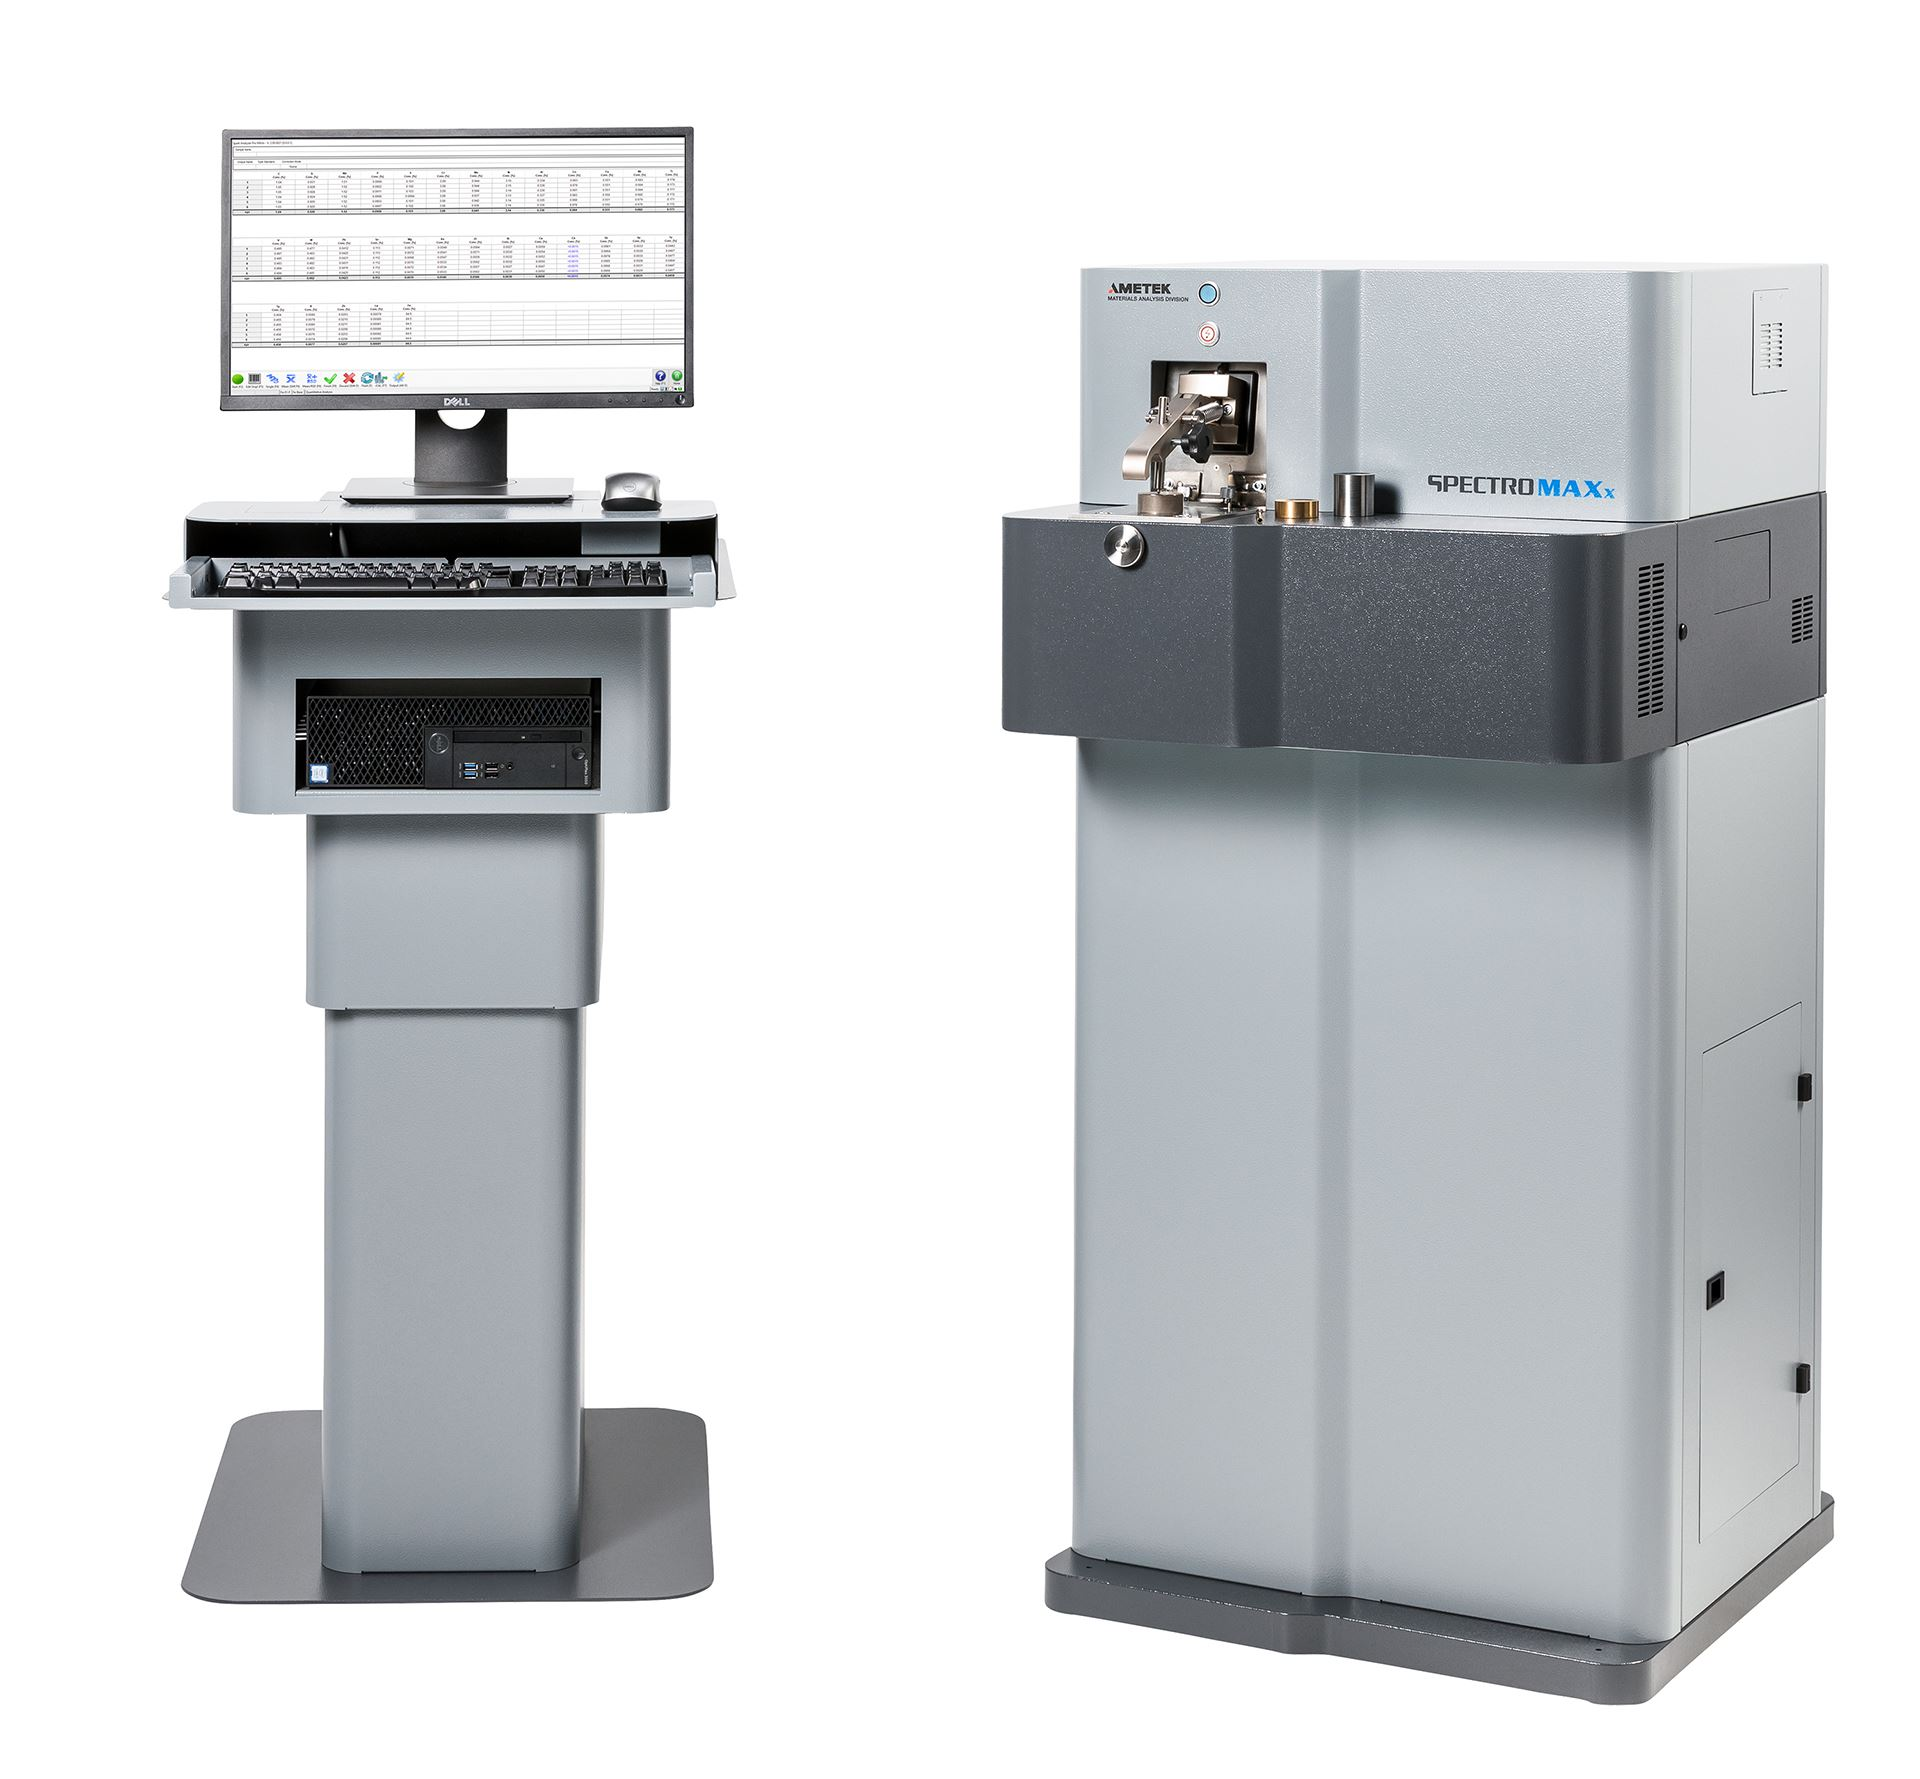 SPECTROMAXx-Funkenspektrometer mit iCAL 2.0